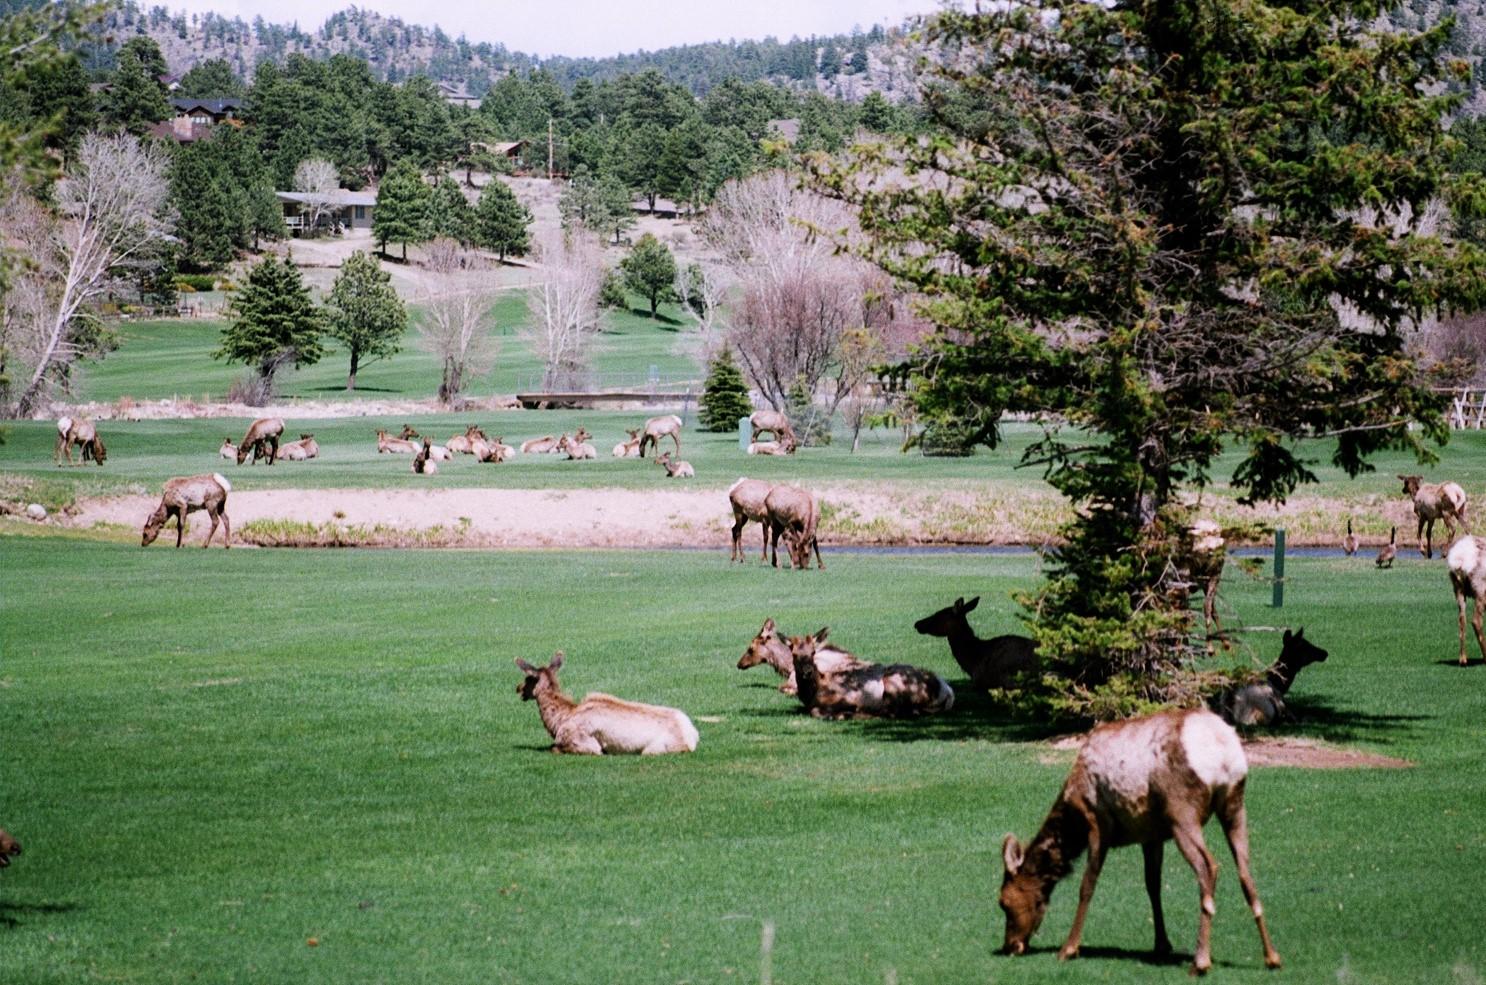 Jake Leininger | Golf Course Takeover | Topcon RE2 | Lomo400